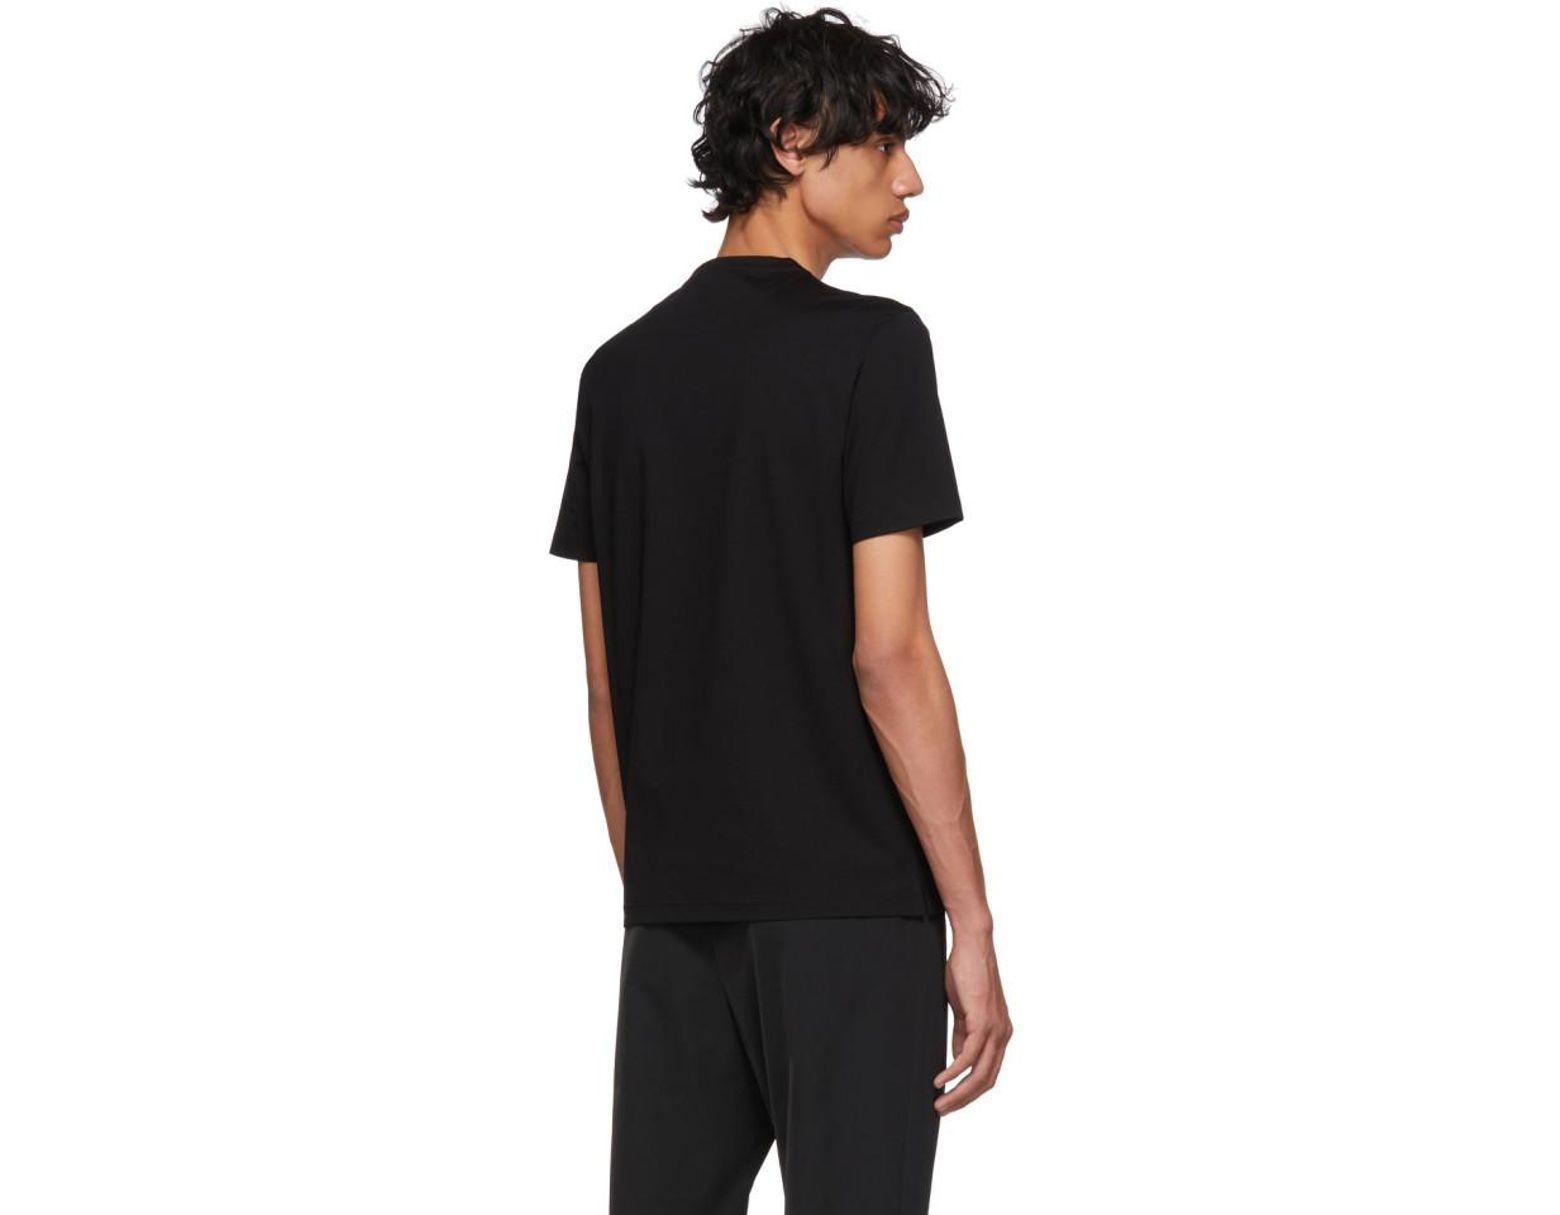 4a2f23986595 Prada Black Satin Pocket T-shirt in Black for Men - Lyst